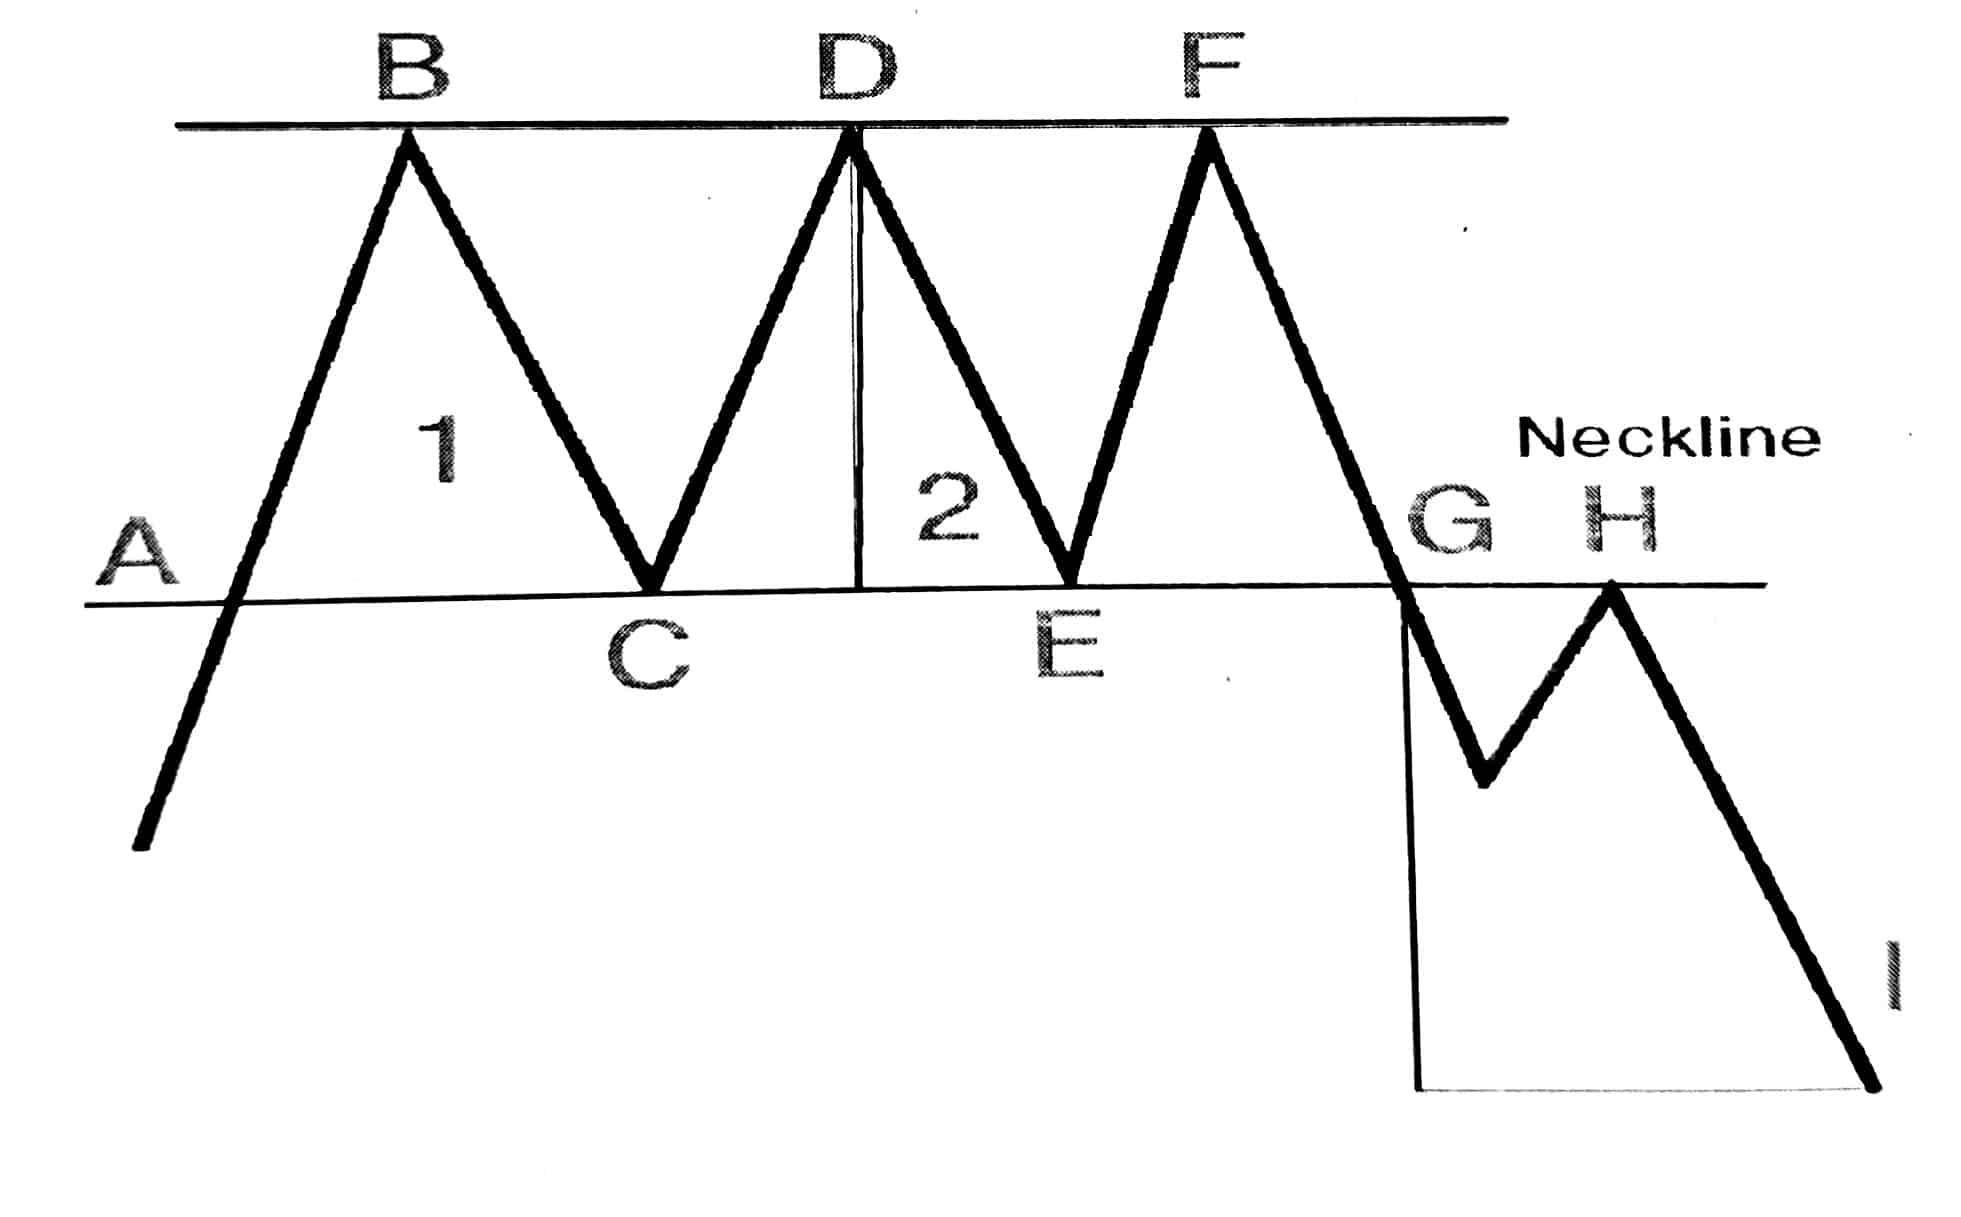 تشکیل الگوی سه گانه